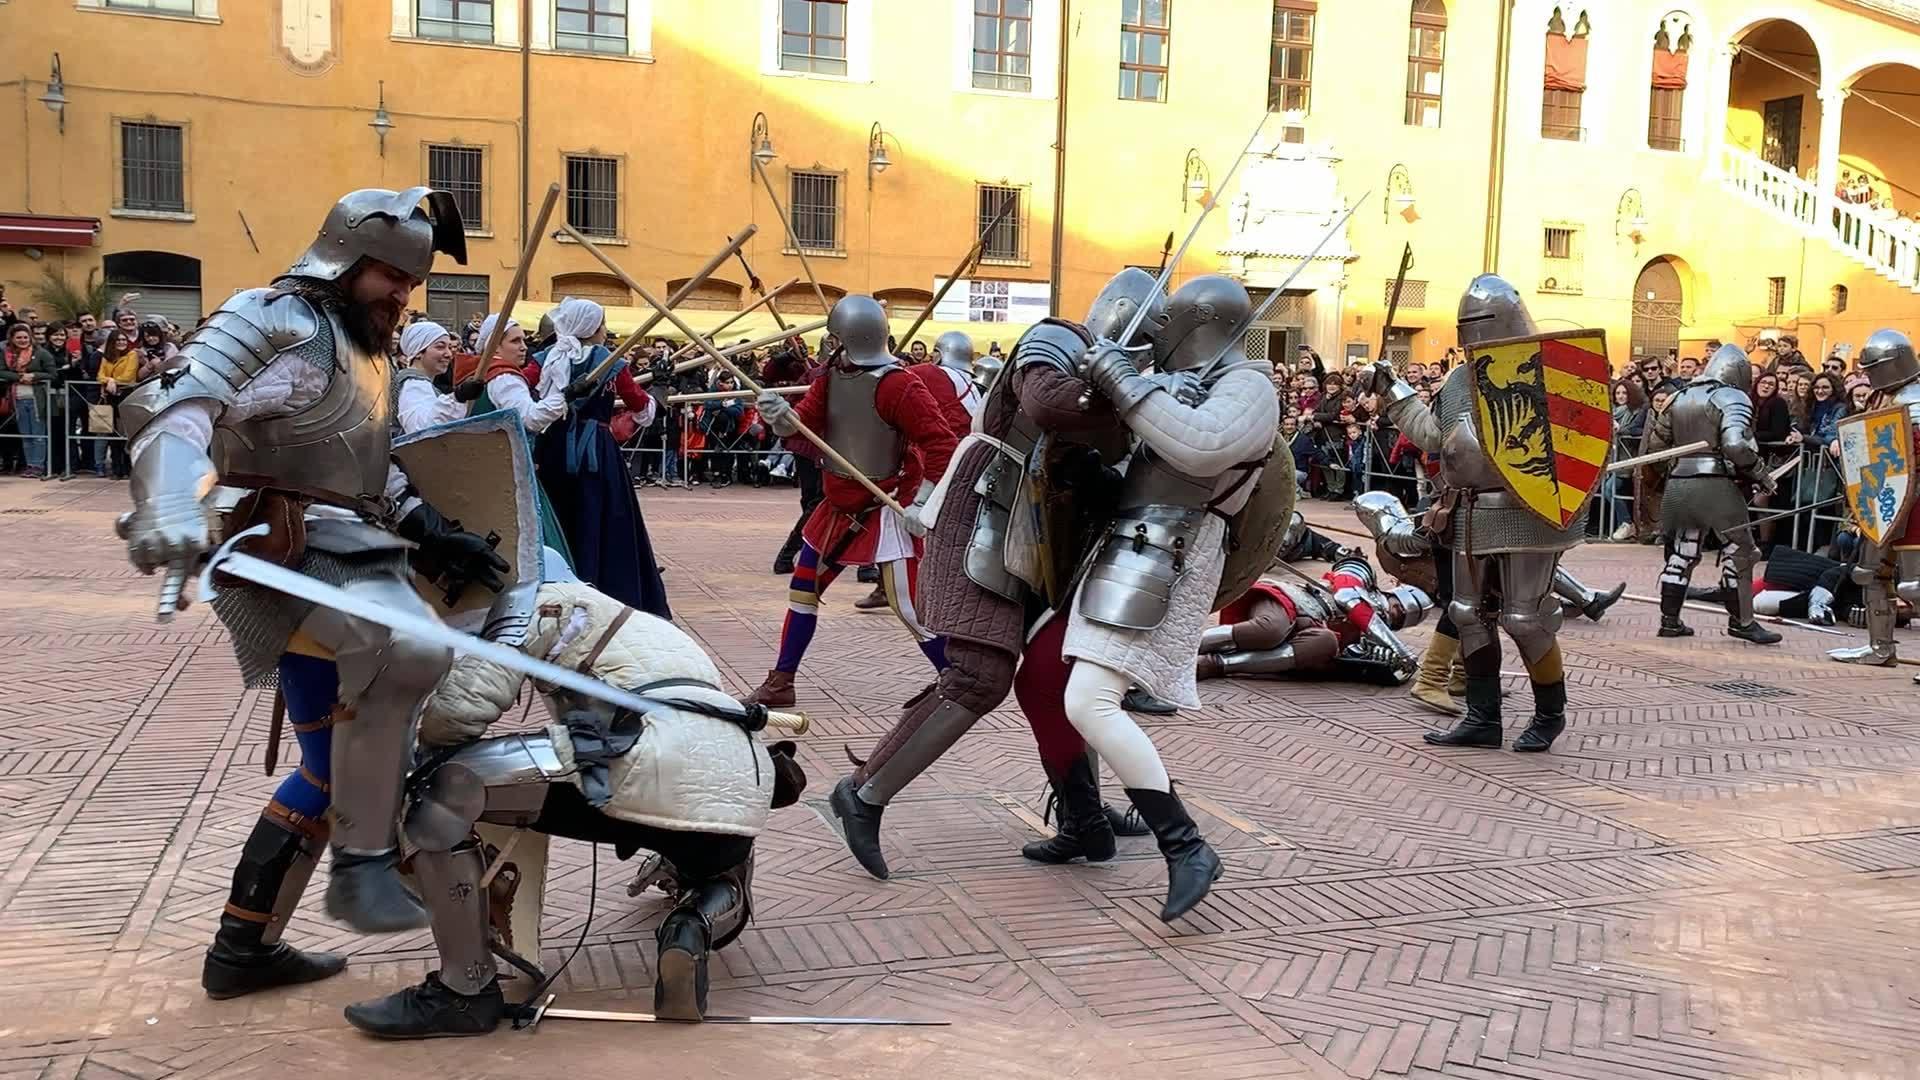 Carnevale Rinascimentale Ferrara 2019 | Ph. Carnevale degli Este via Facebook